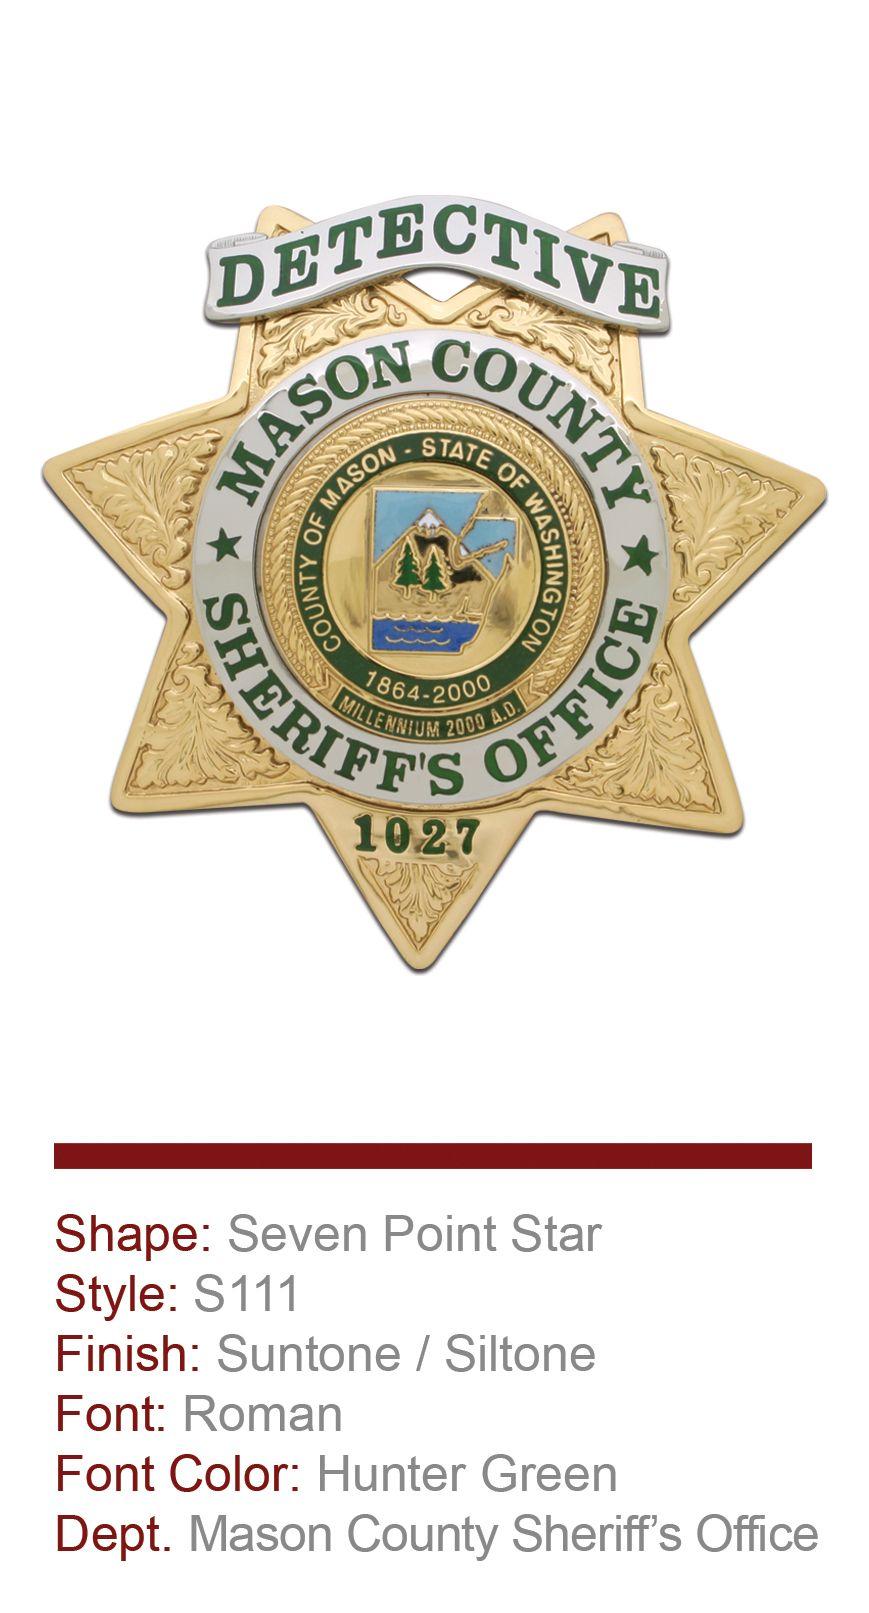 Mason County Sheriff's Office